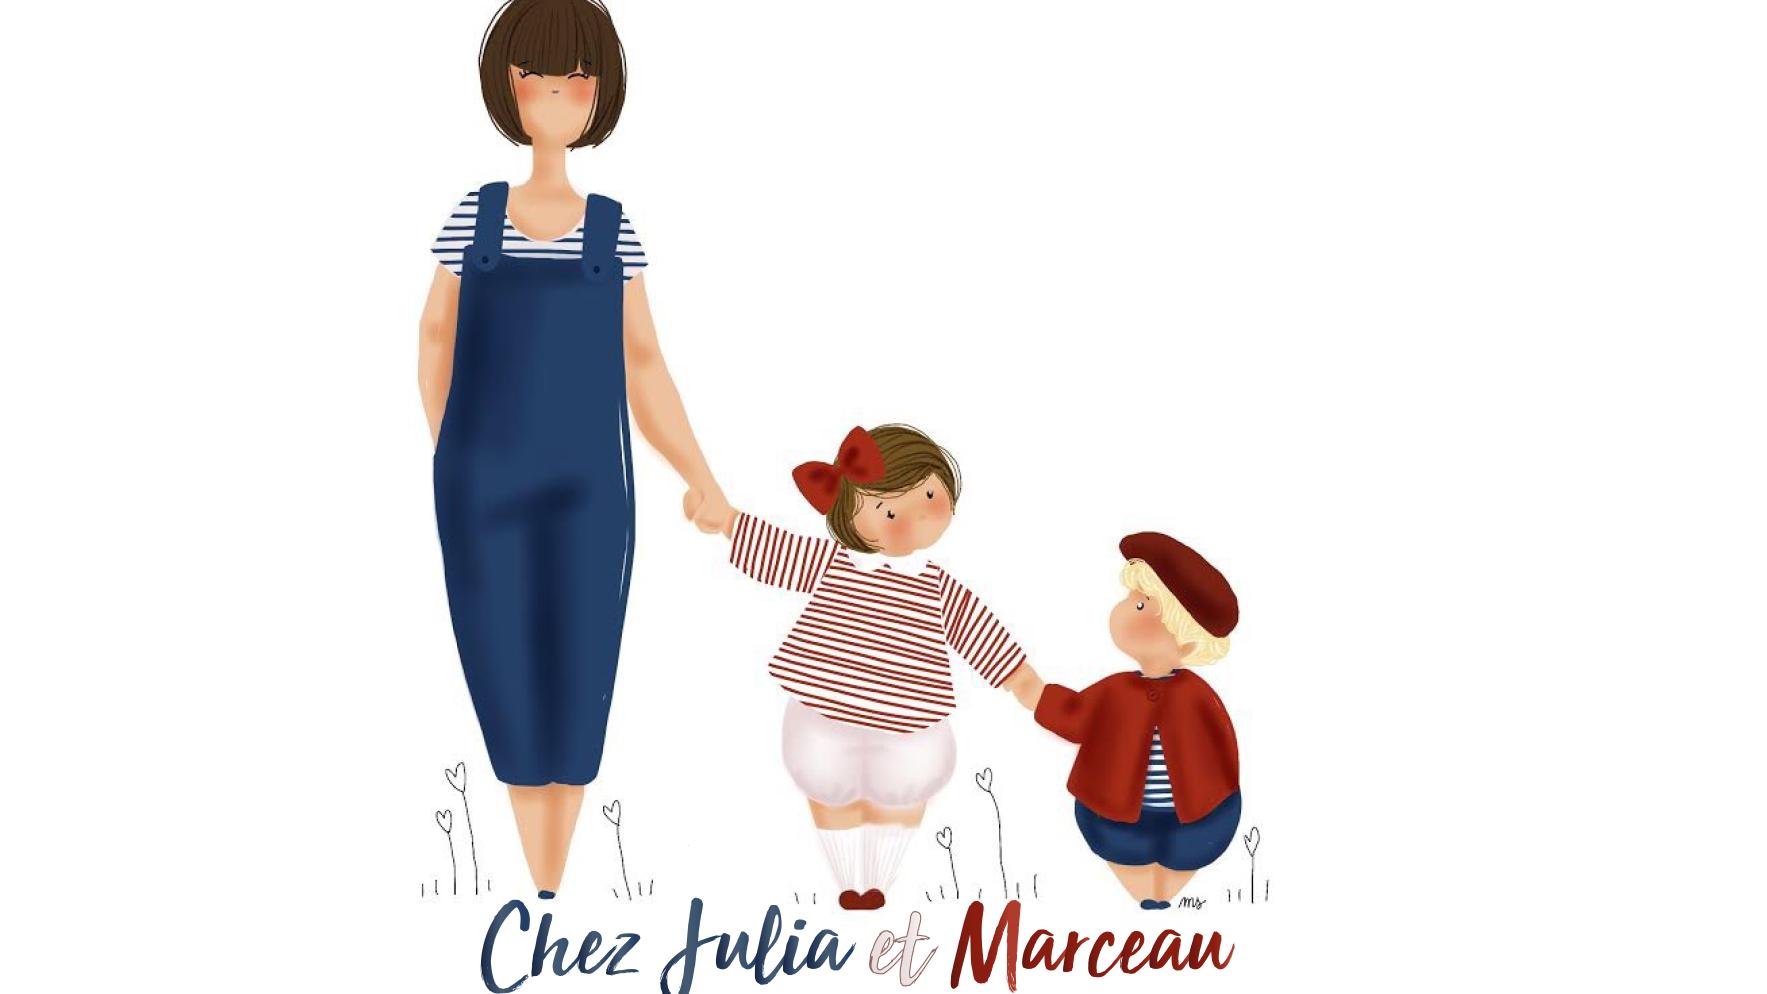 LOGO_-_Chez_Julia_et_Marceau-1523899599.jpg